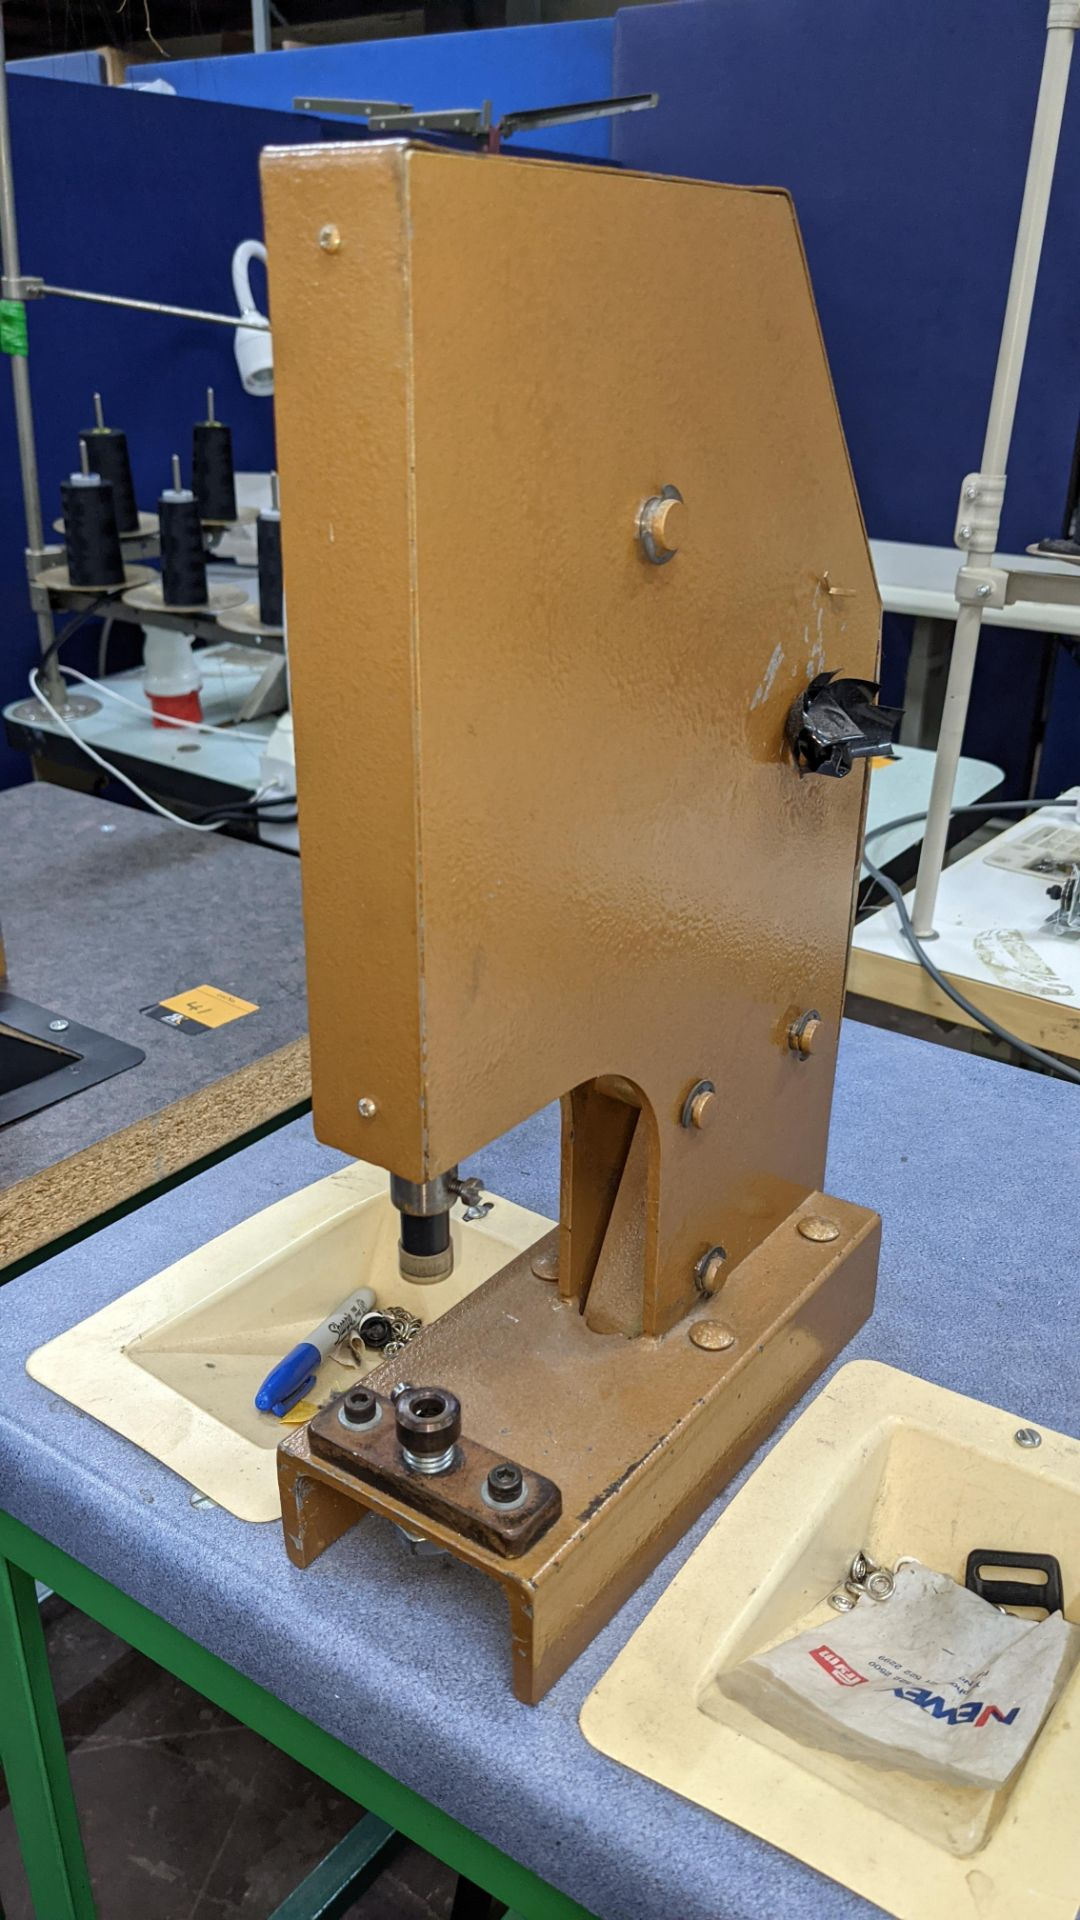 Foot operated riveting machine/press stud machine - Image 4 of 8